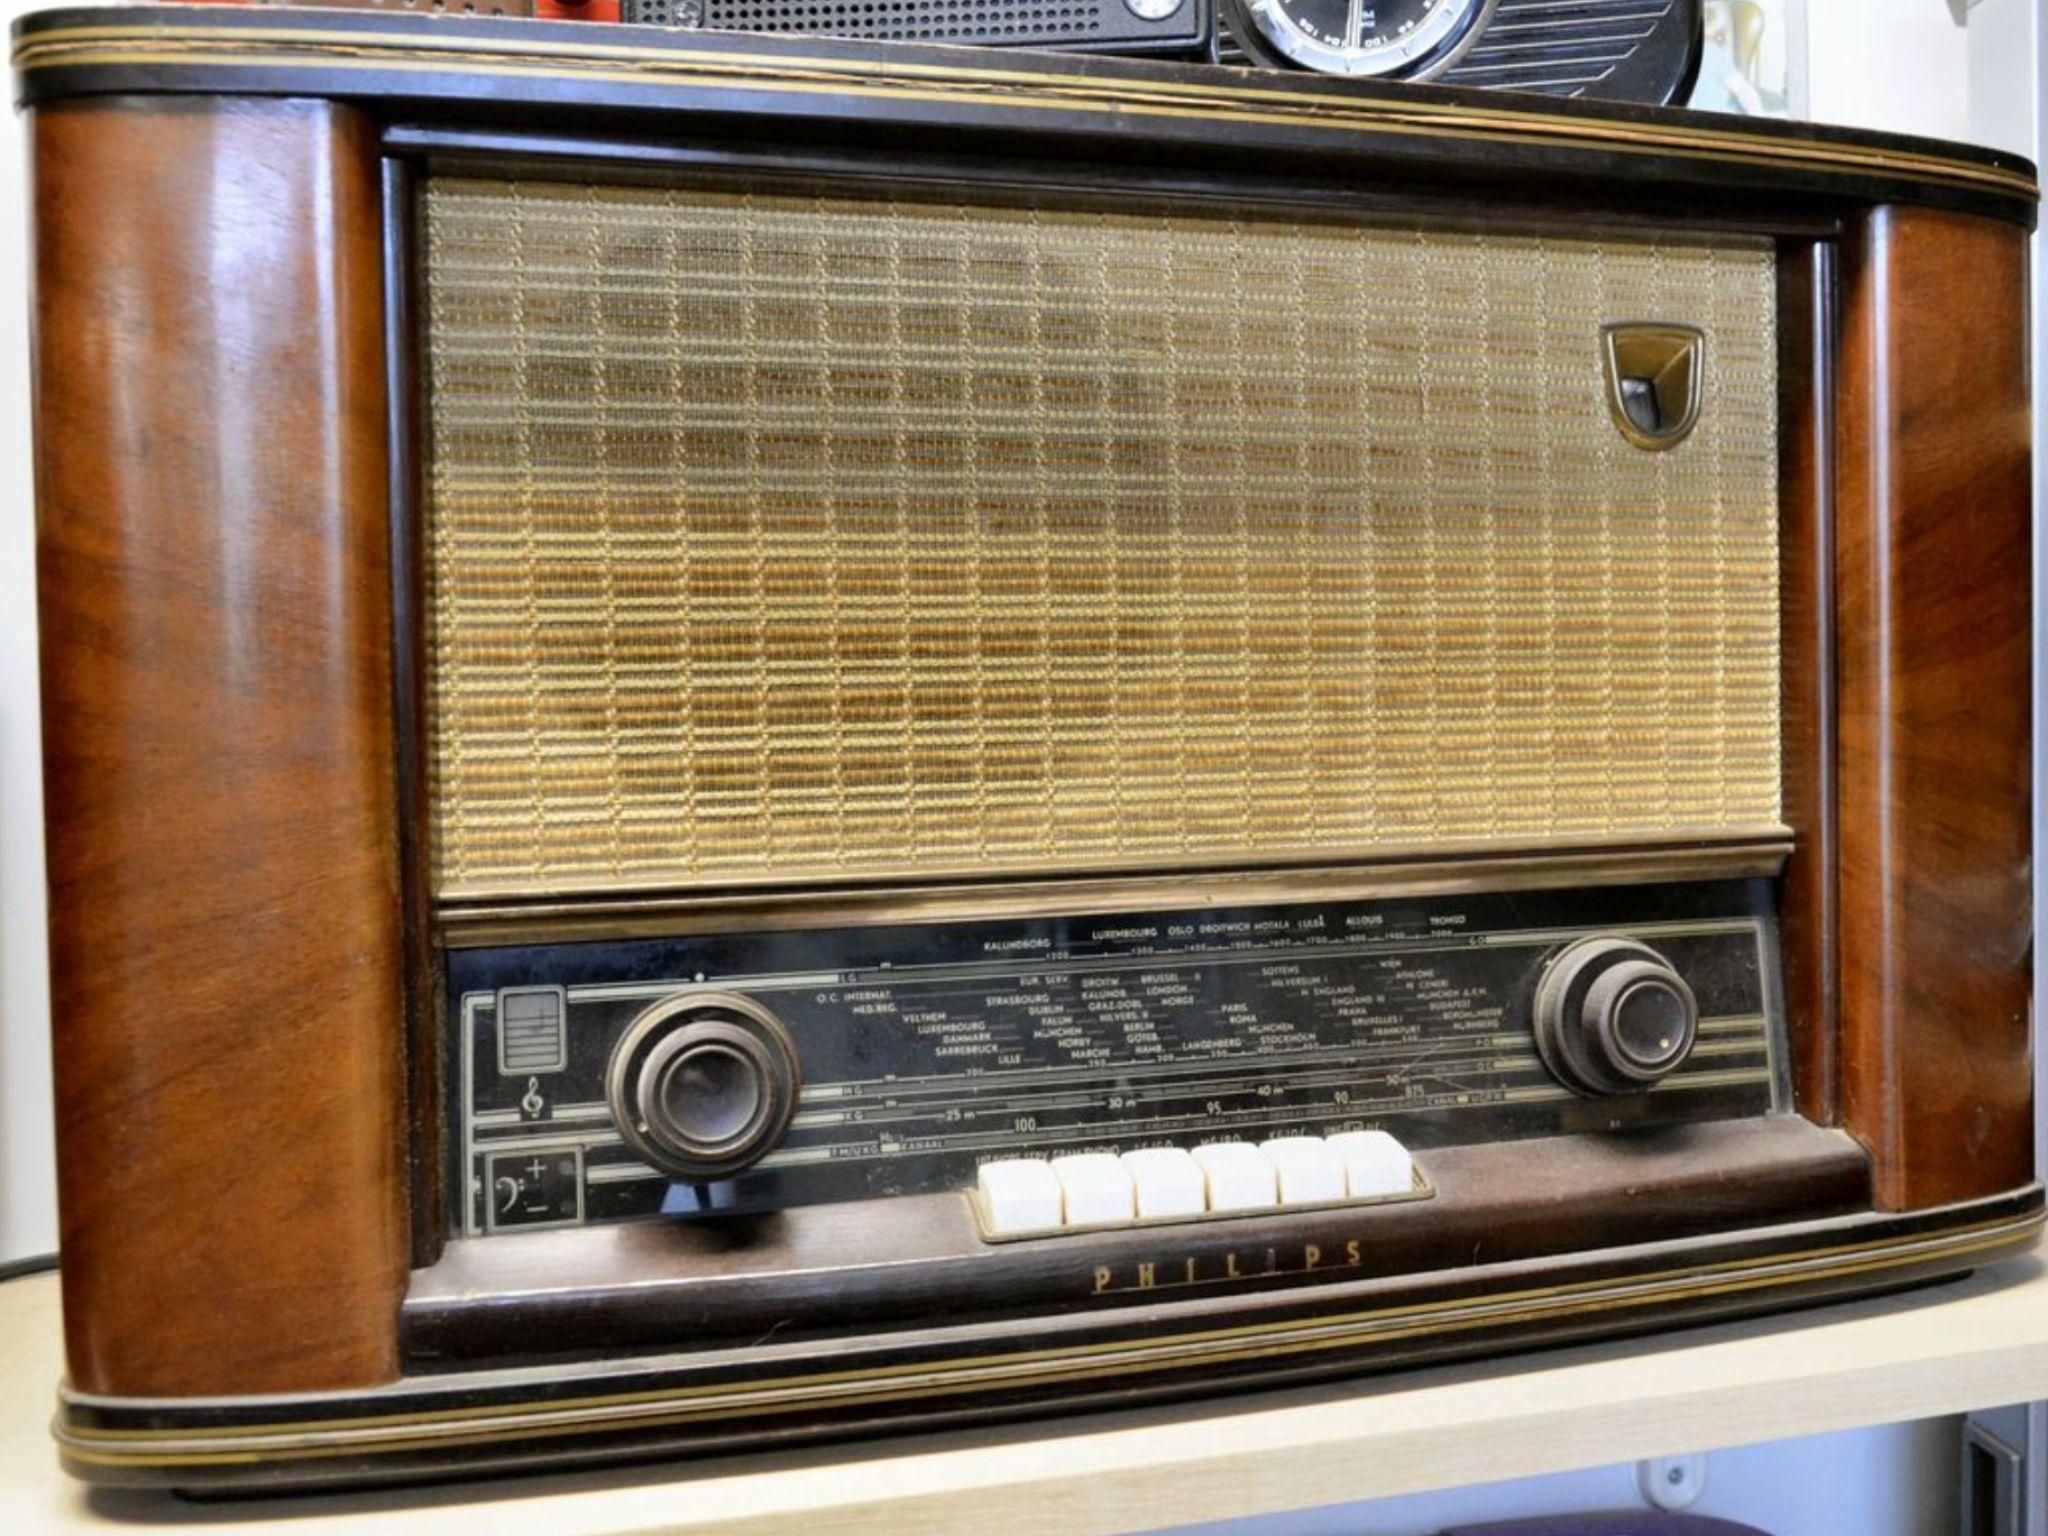 A Philips Mantel Radio Model 167 Pink Vintage Radio Antique Radio Old Radios